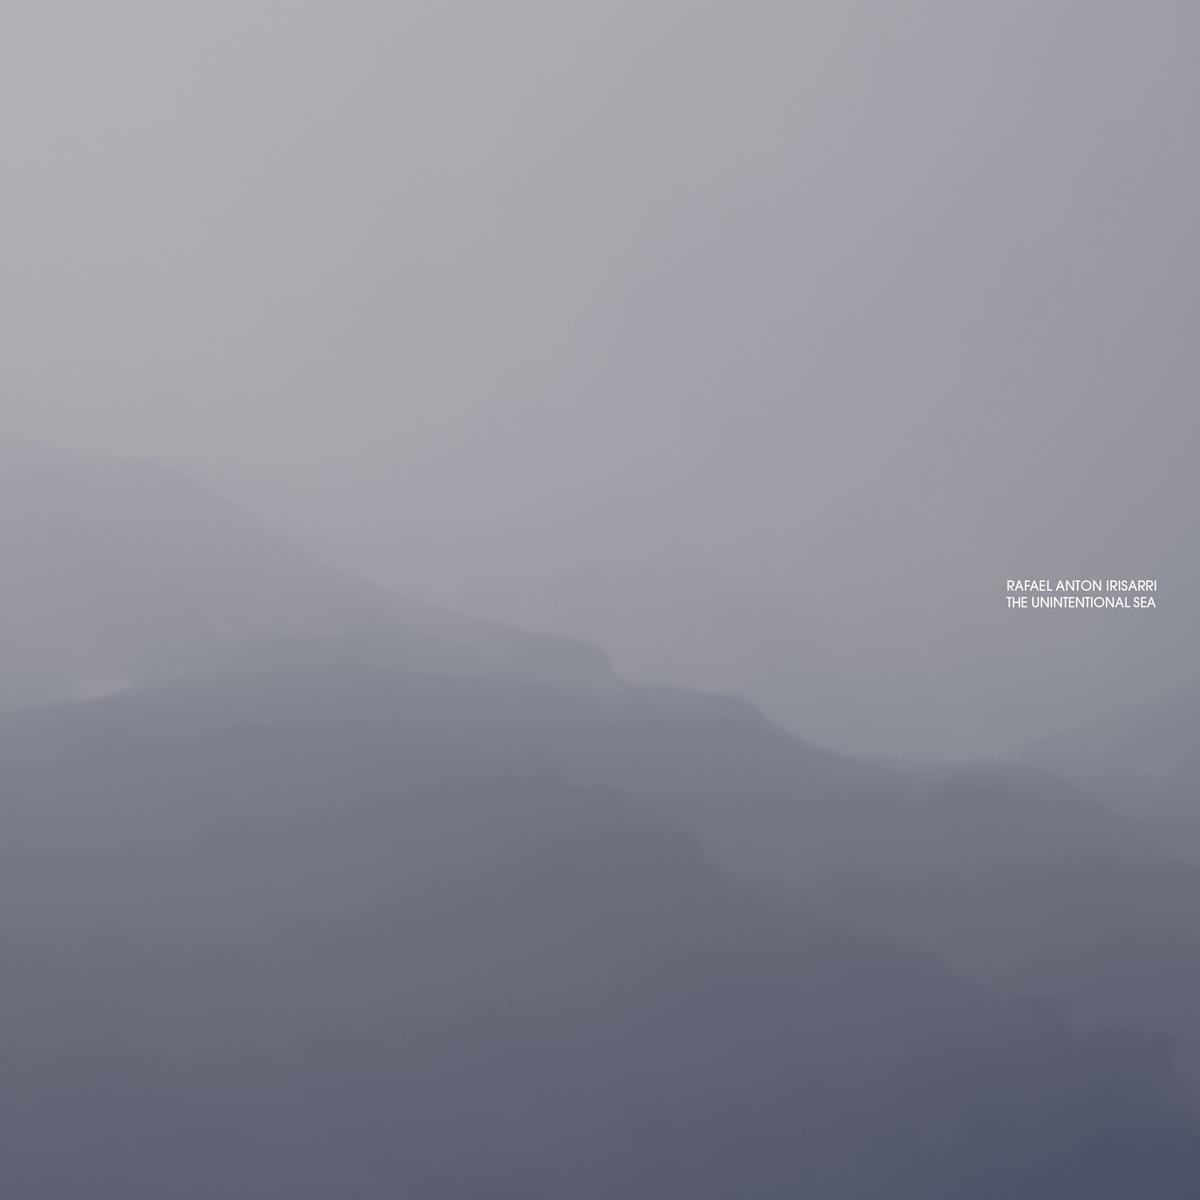 Rafael Anton Irisarri - The Unintentional Sea.jpg